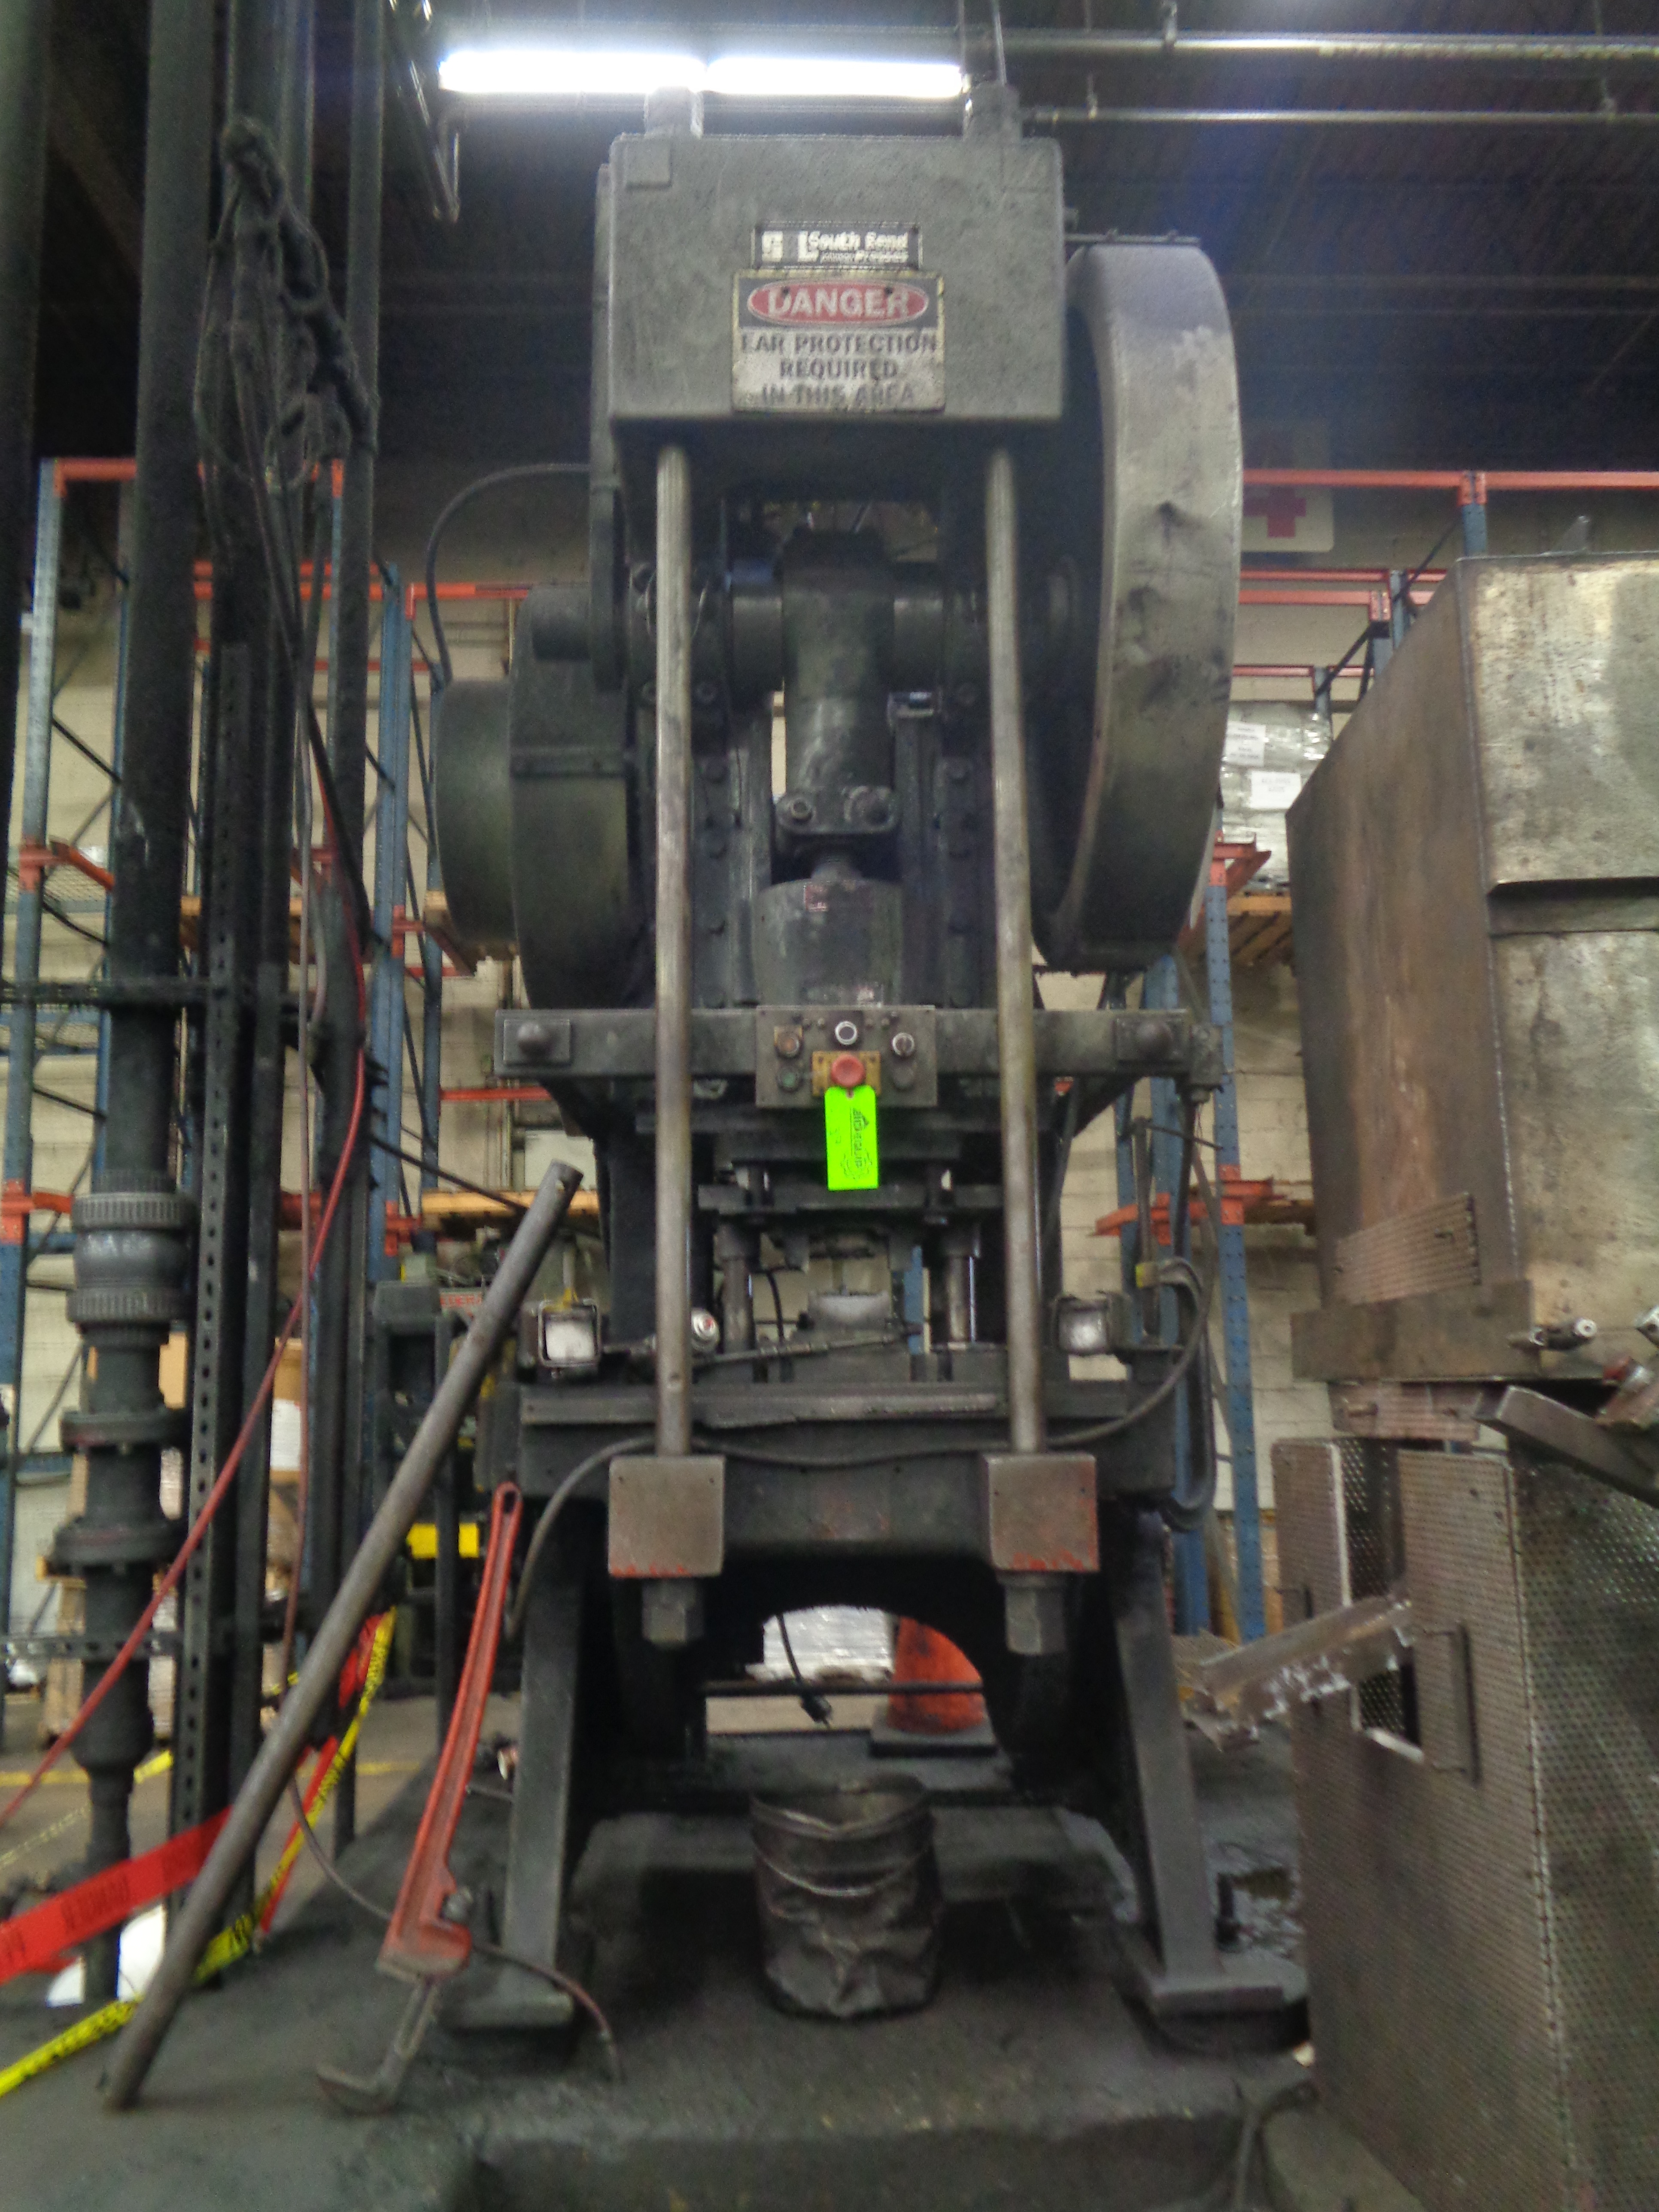 South Bend Press 125 Ton Located in Swedsboro NJ